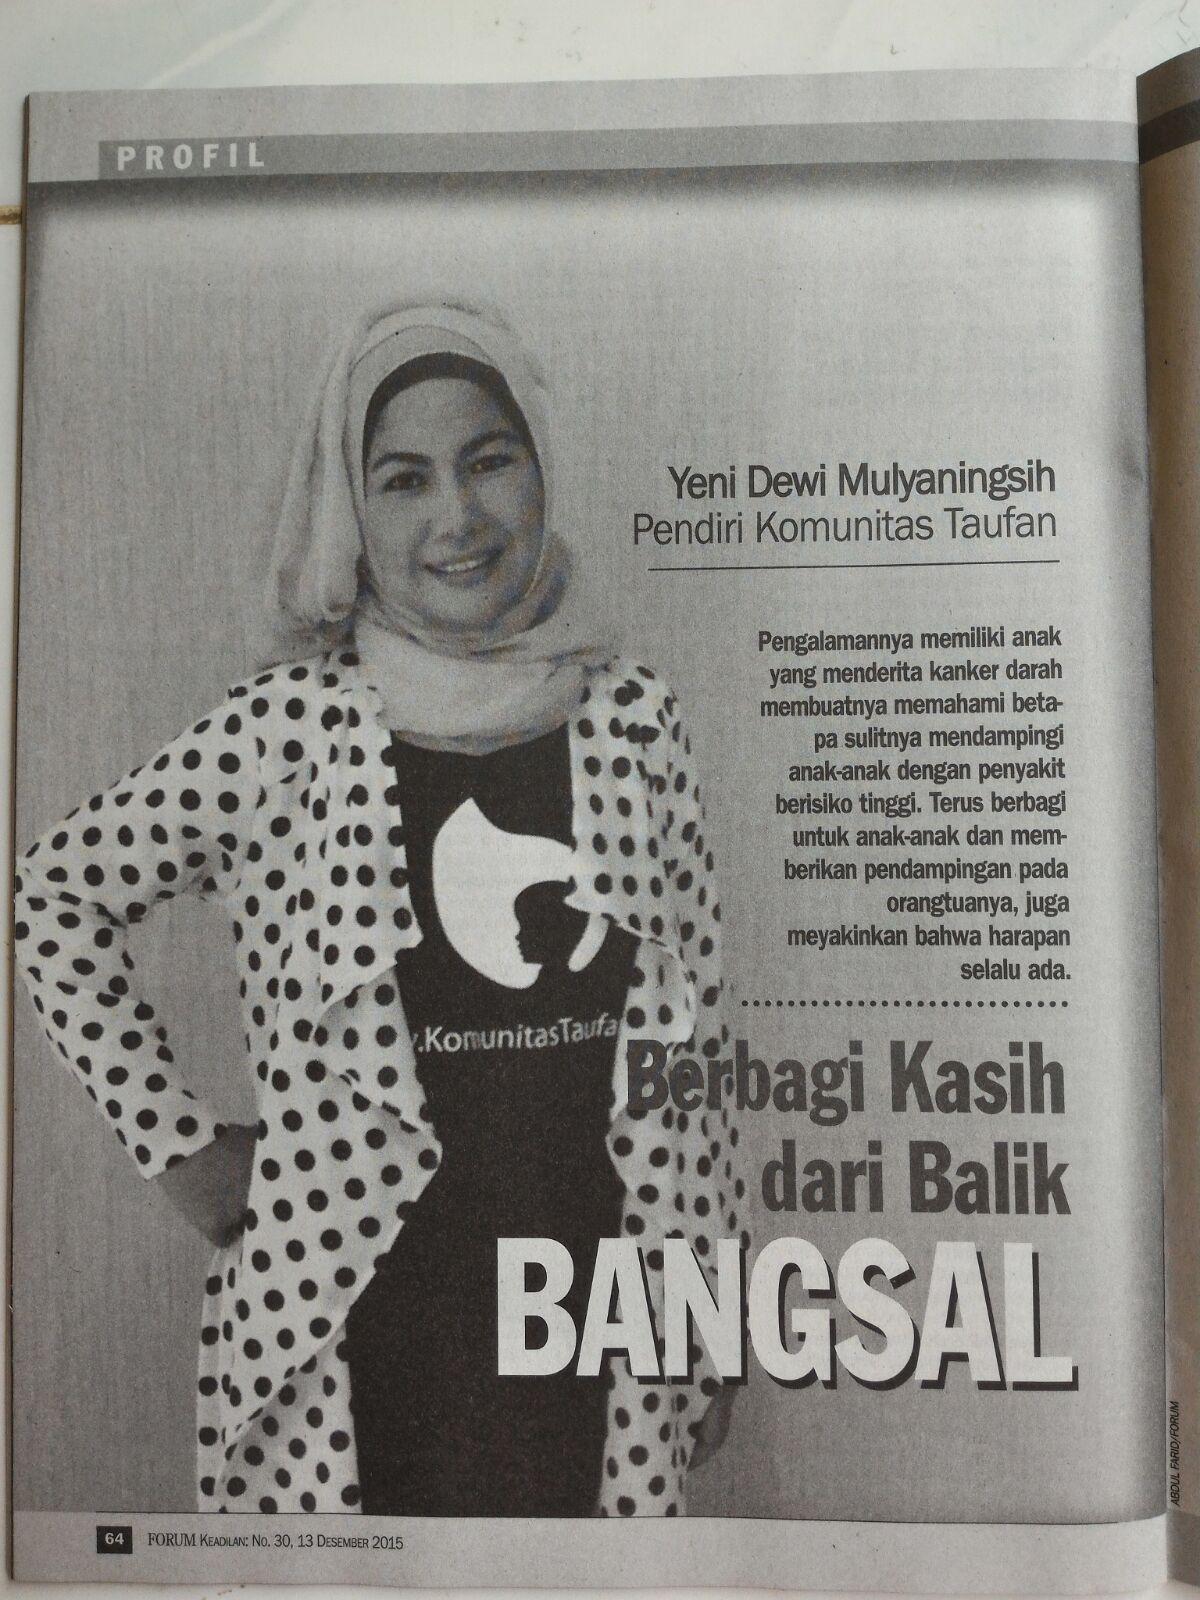 Forum_Keadilan_20151213_Yeni_Dewi_Mulyaningsih__Komunitas_Taufan_Berbagi_Kasih_dari_Balik_Bangsal_01